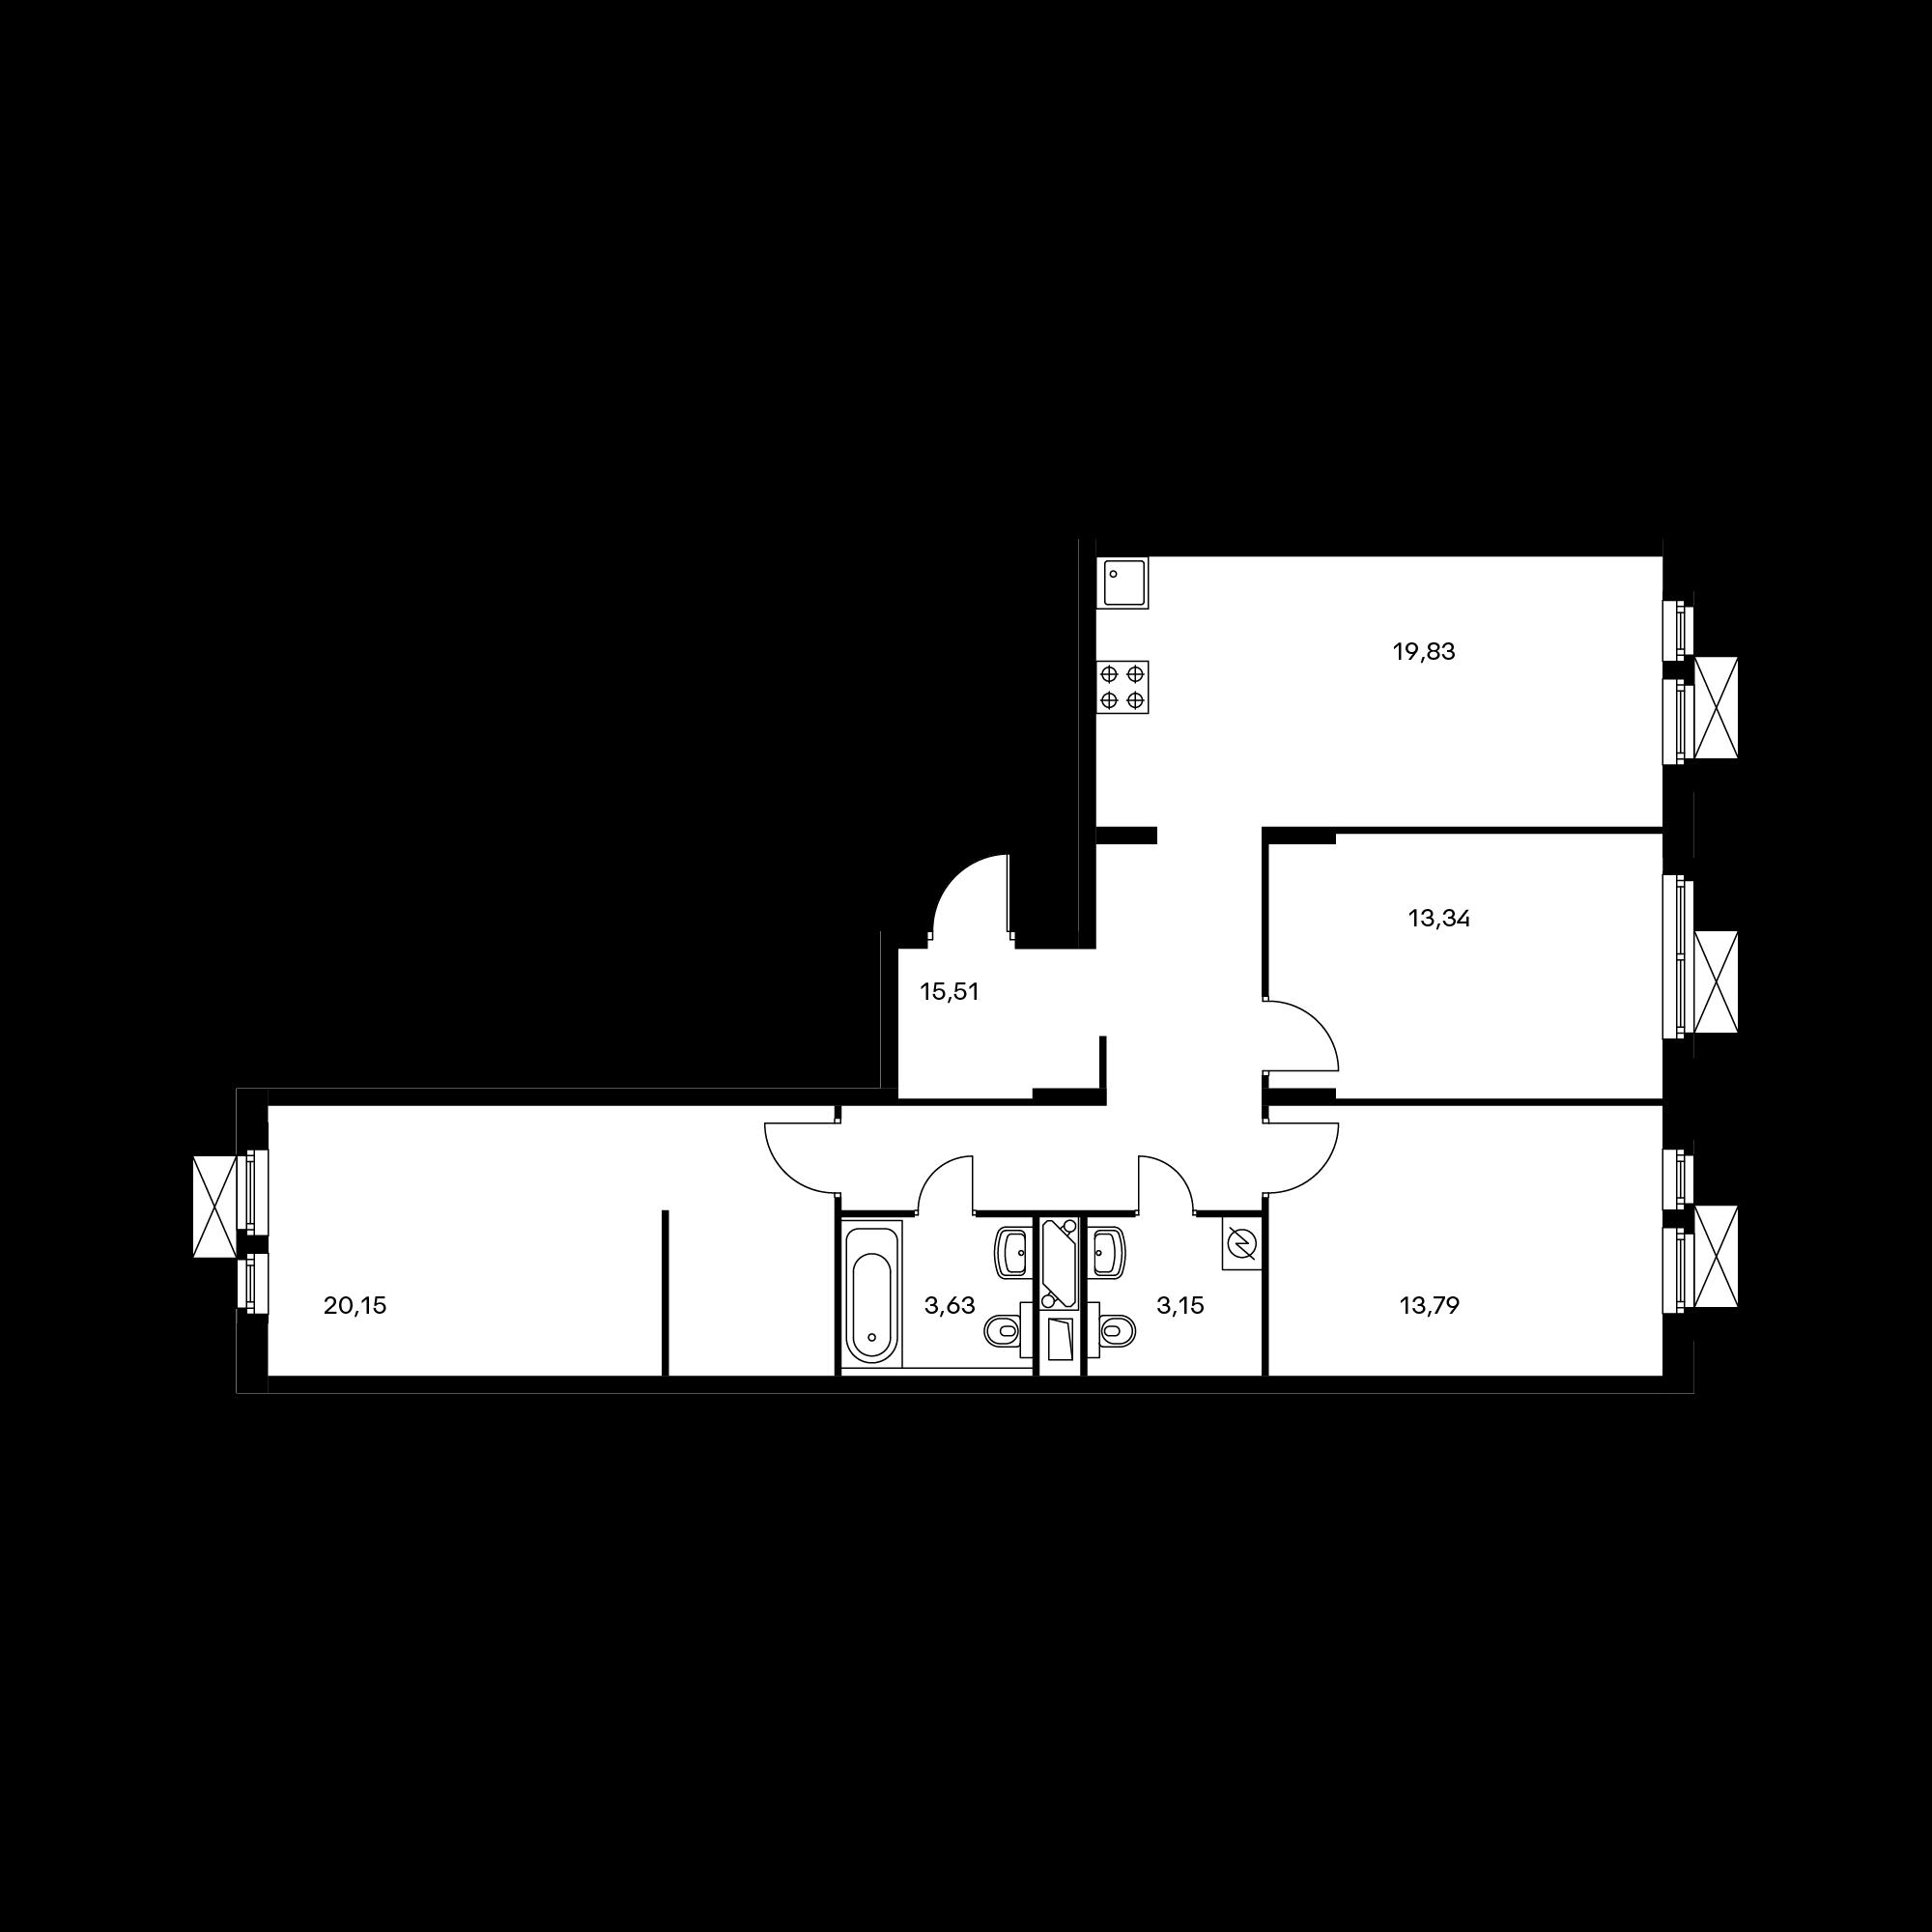 3EL1_9.6_1